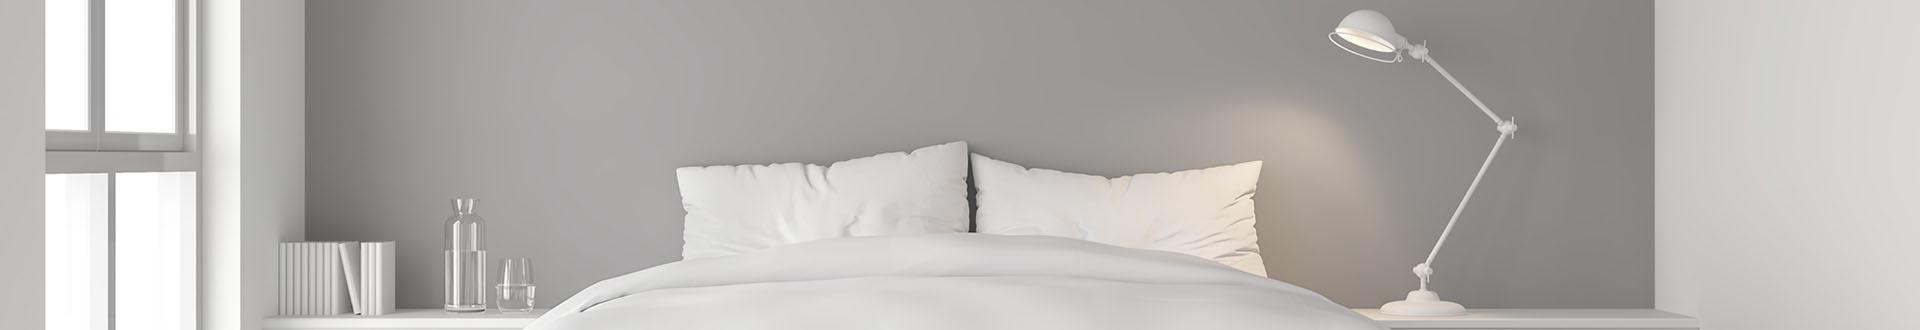 łóżko i lampka